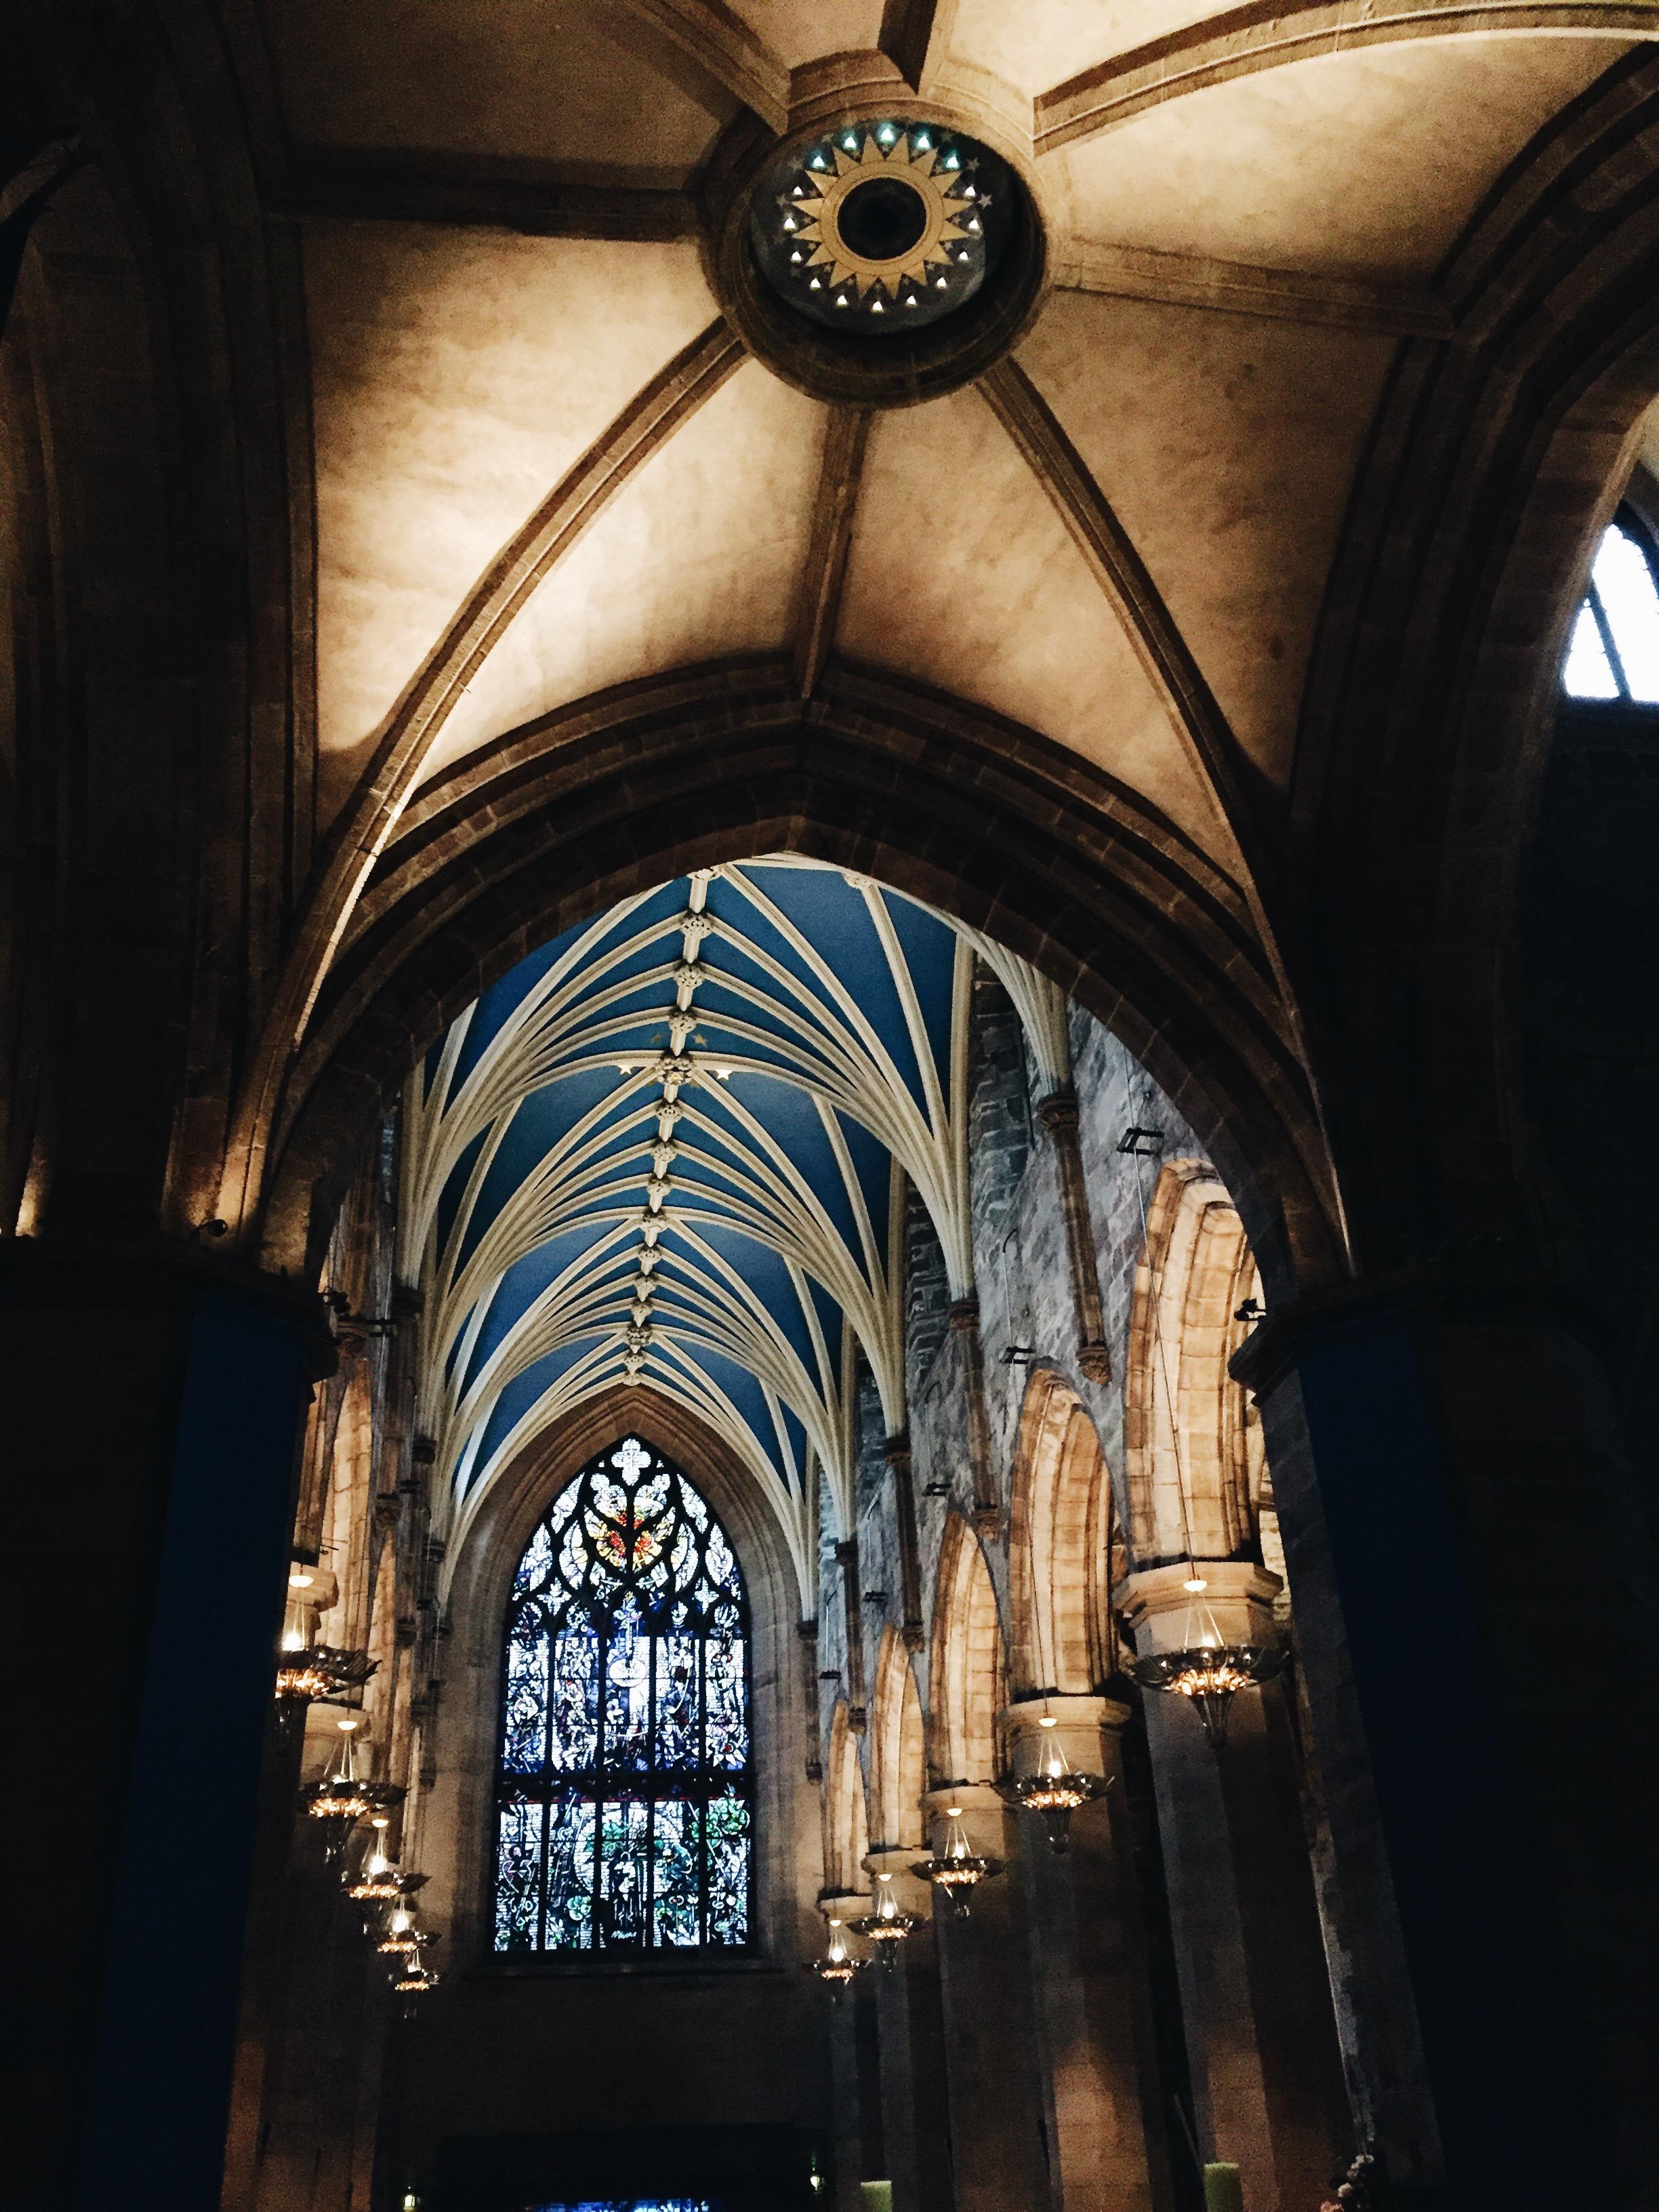 SOA_Edinburgh-Scotland-st-giles-cathedral.jpg